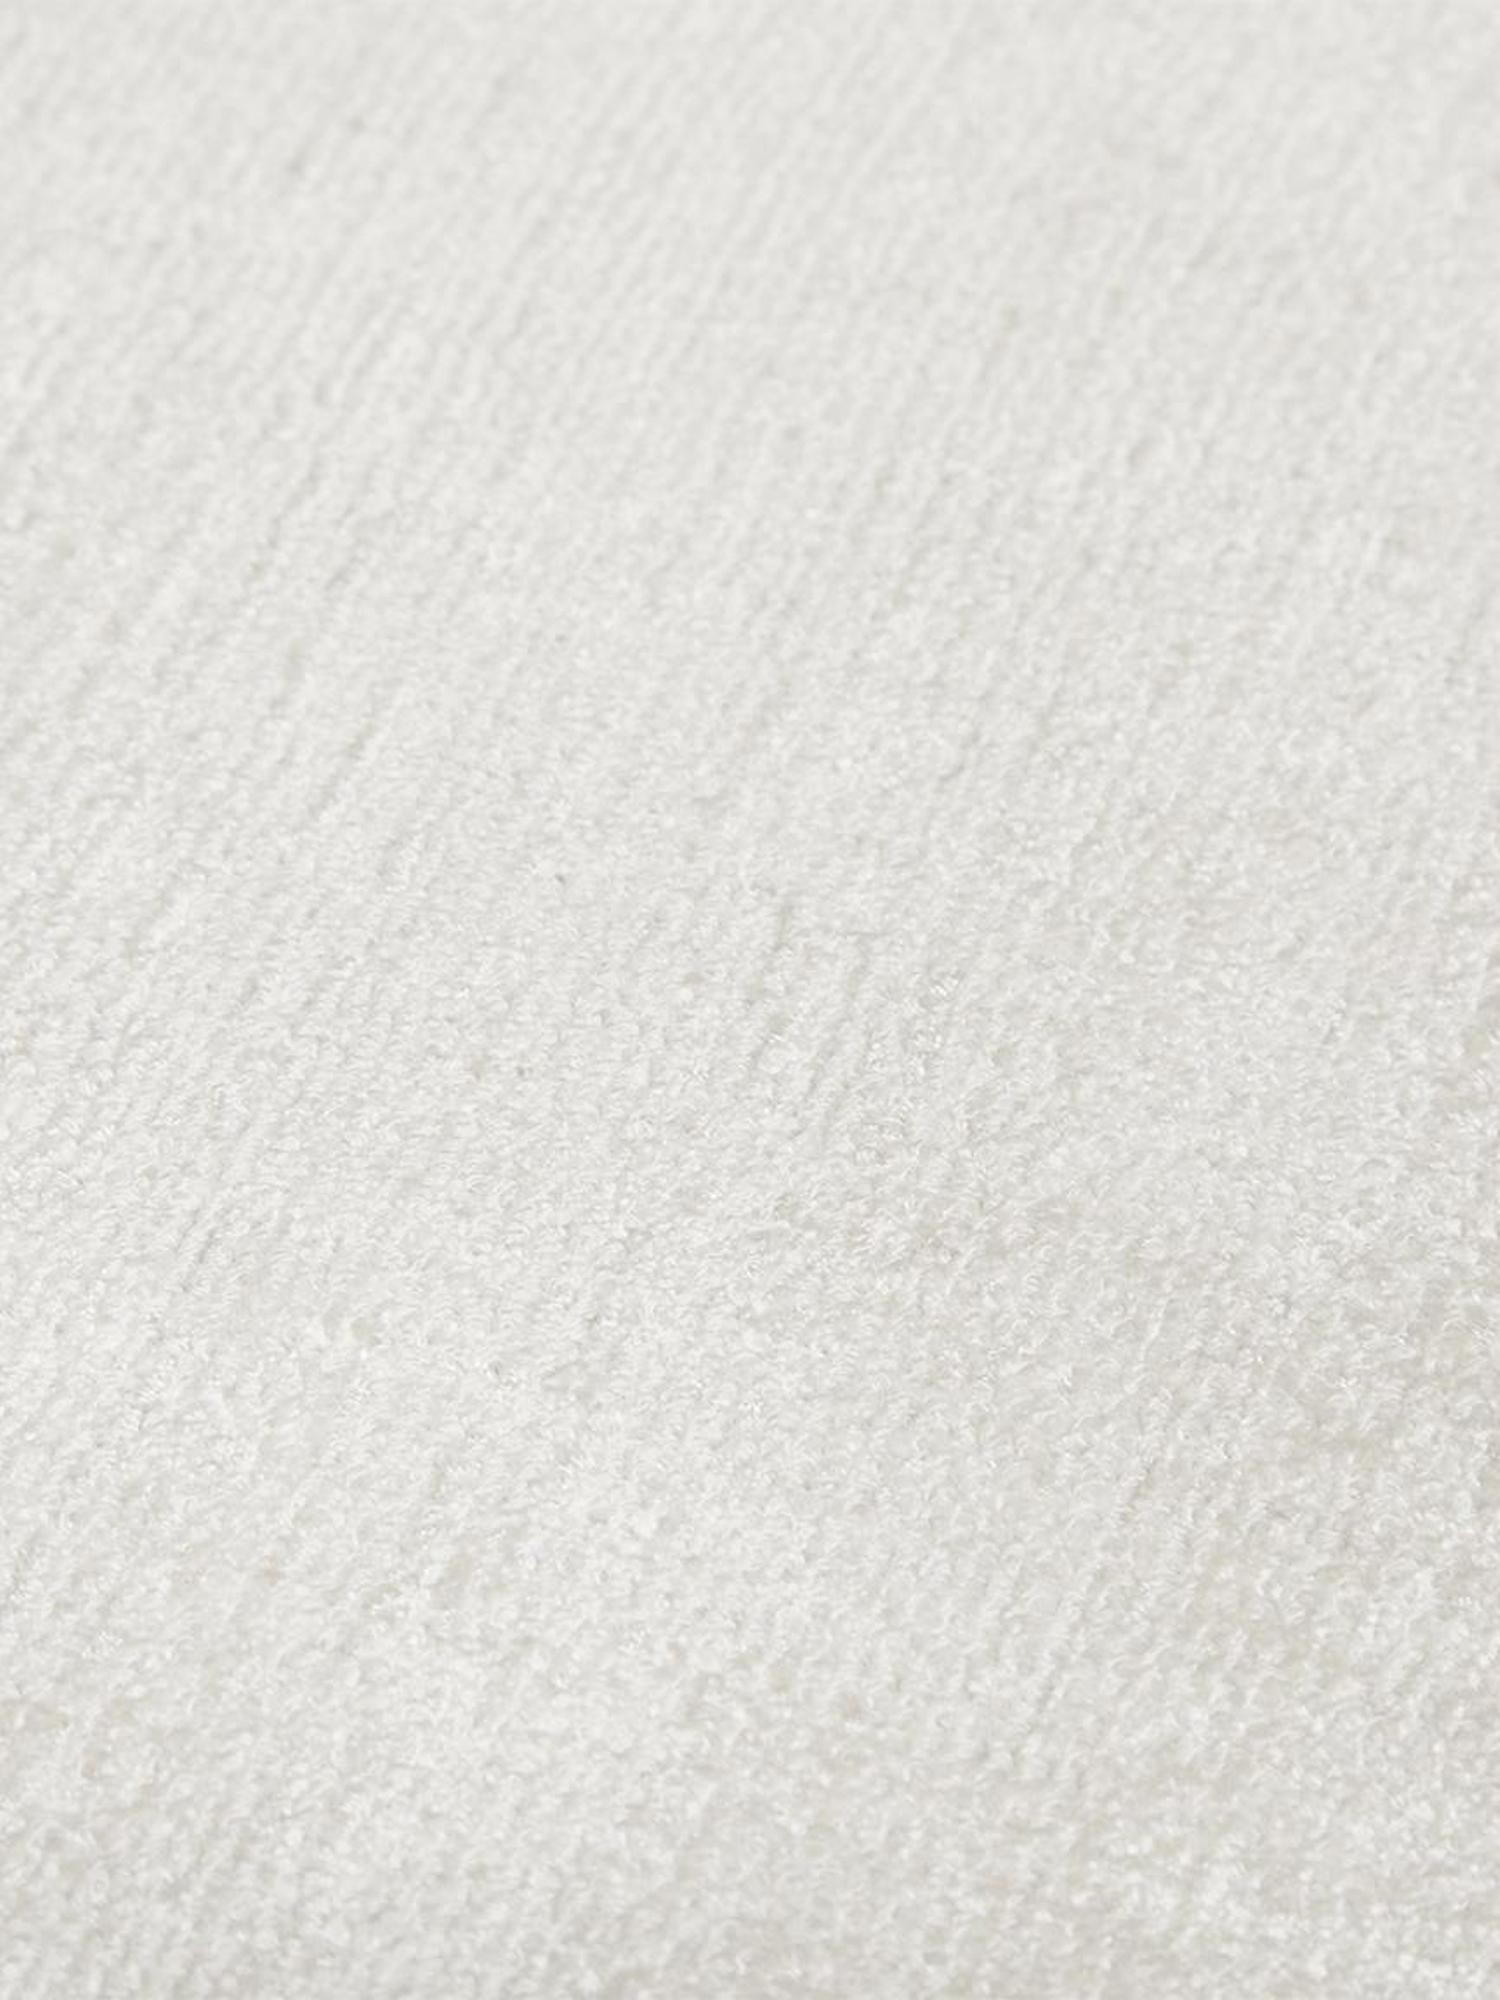 Handgewebter Viskoseteppich Jane in Elfenbeinfarben, Flor: 100% Viskose, Elfenbeinfarben, B 90 x L 150 cm (Grösse XS)